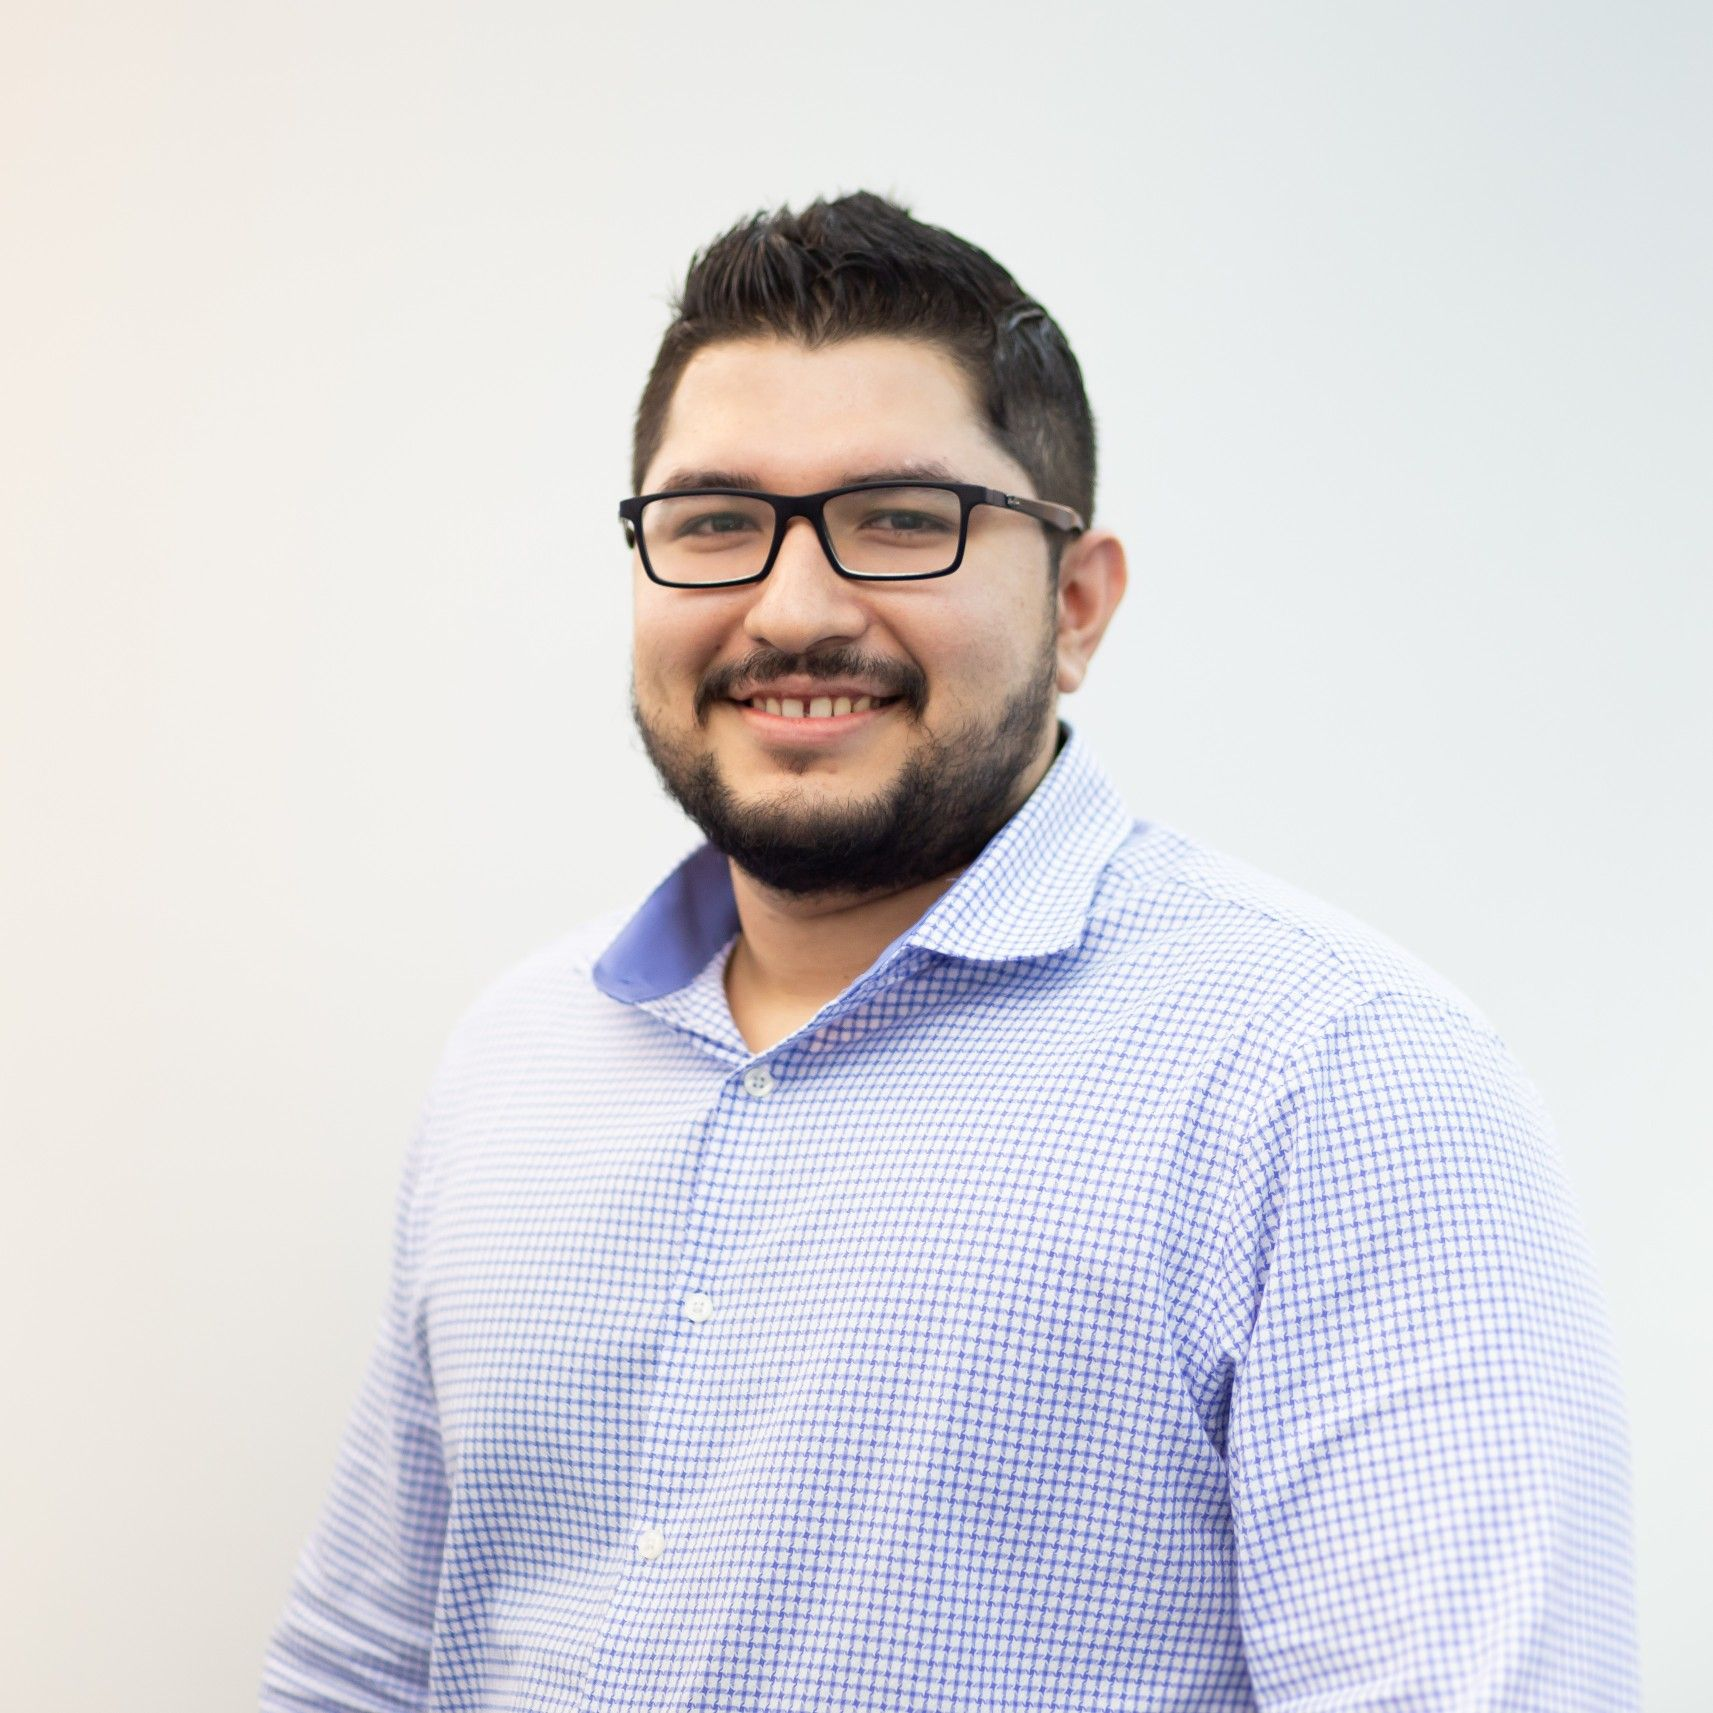 Juan Prado Rodriguez